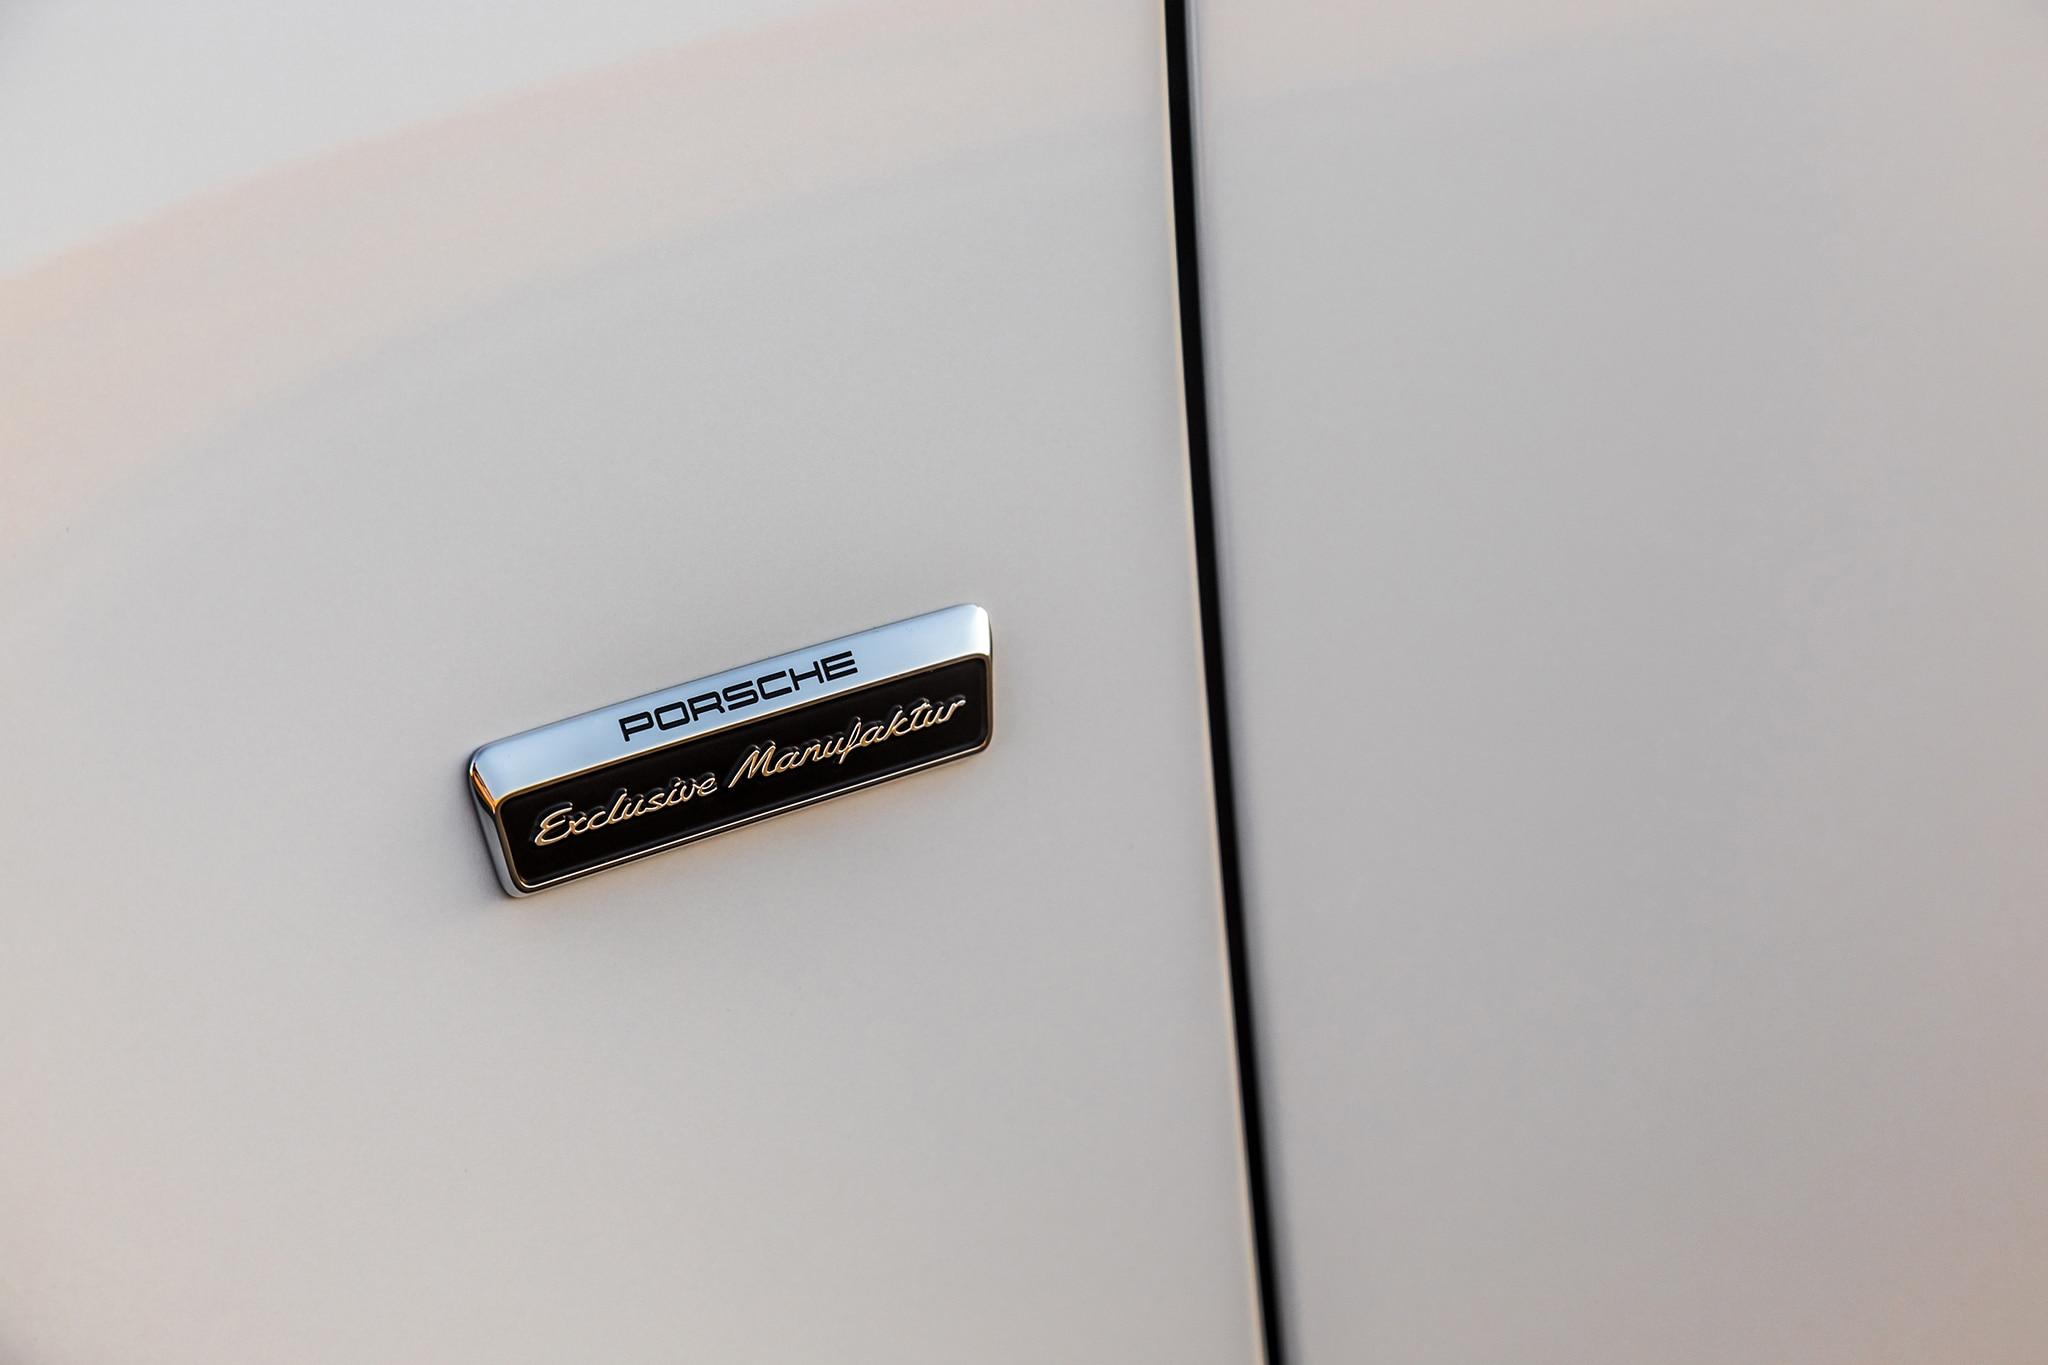 2018 Porsche 911 Turbo S Exclusive Badge